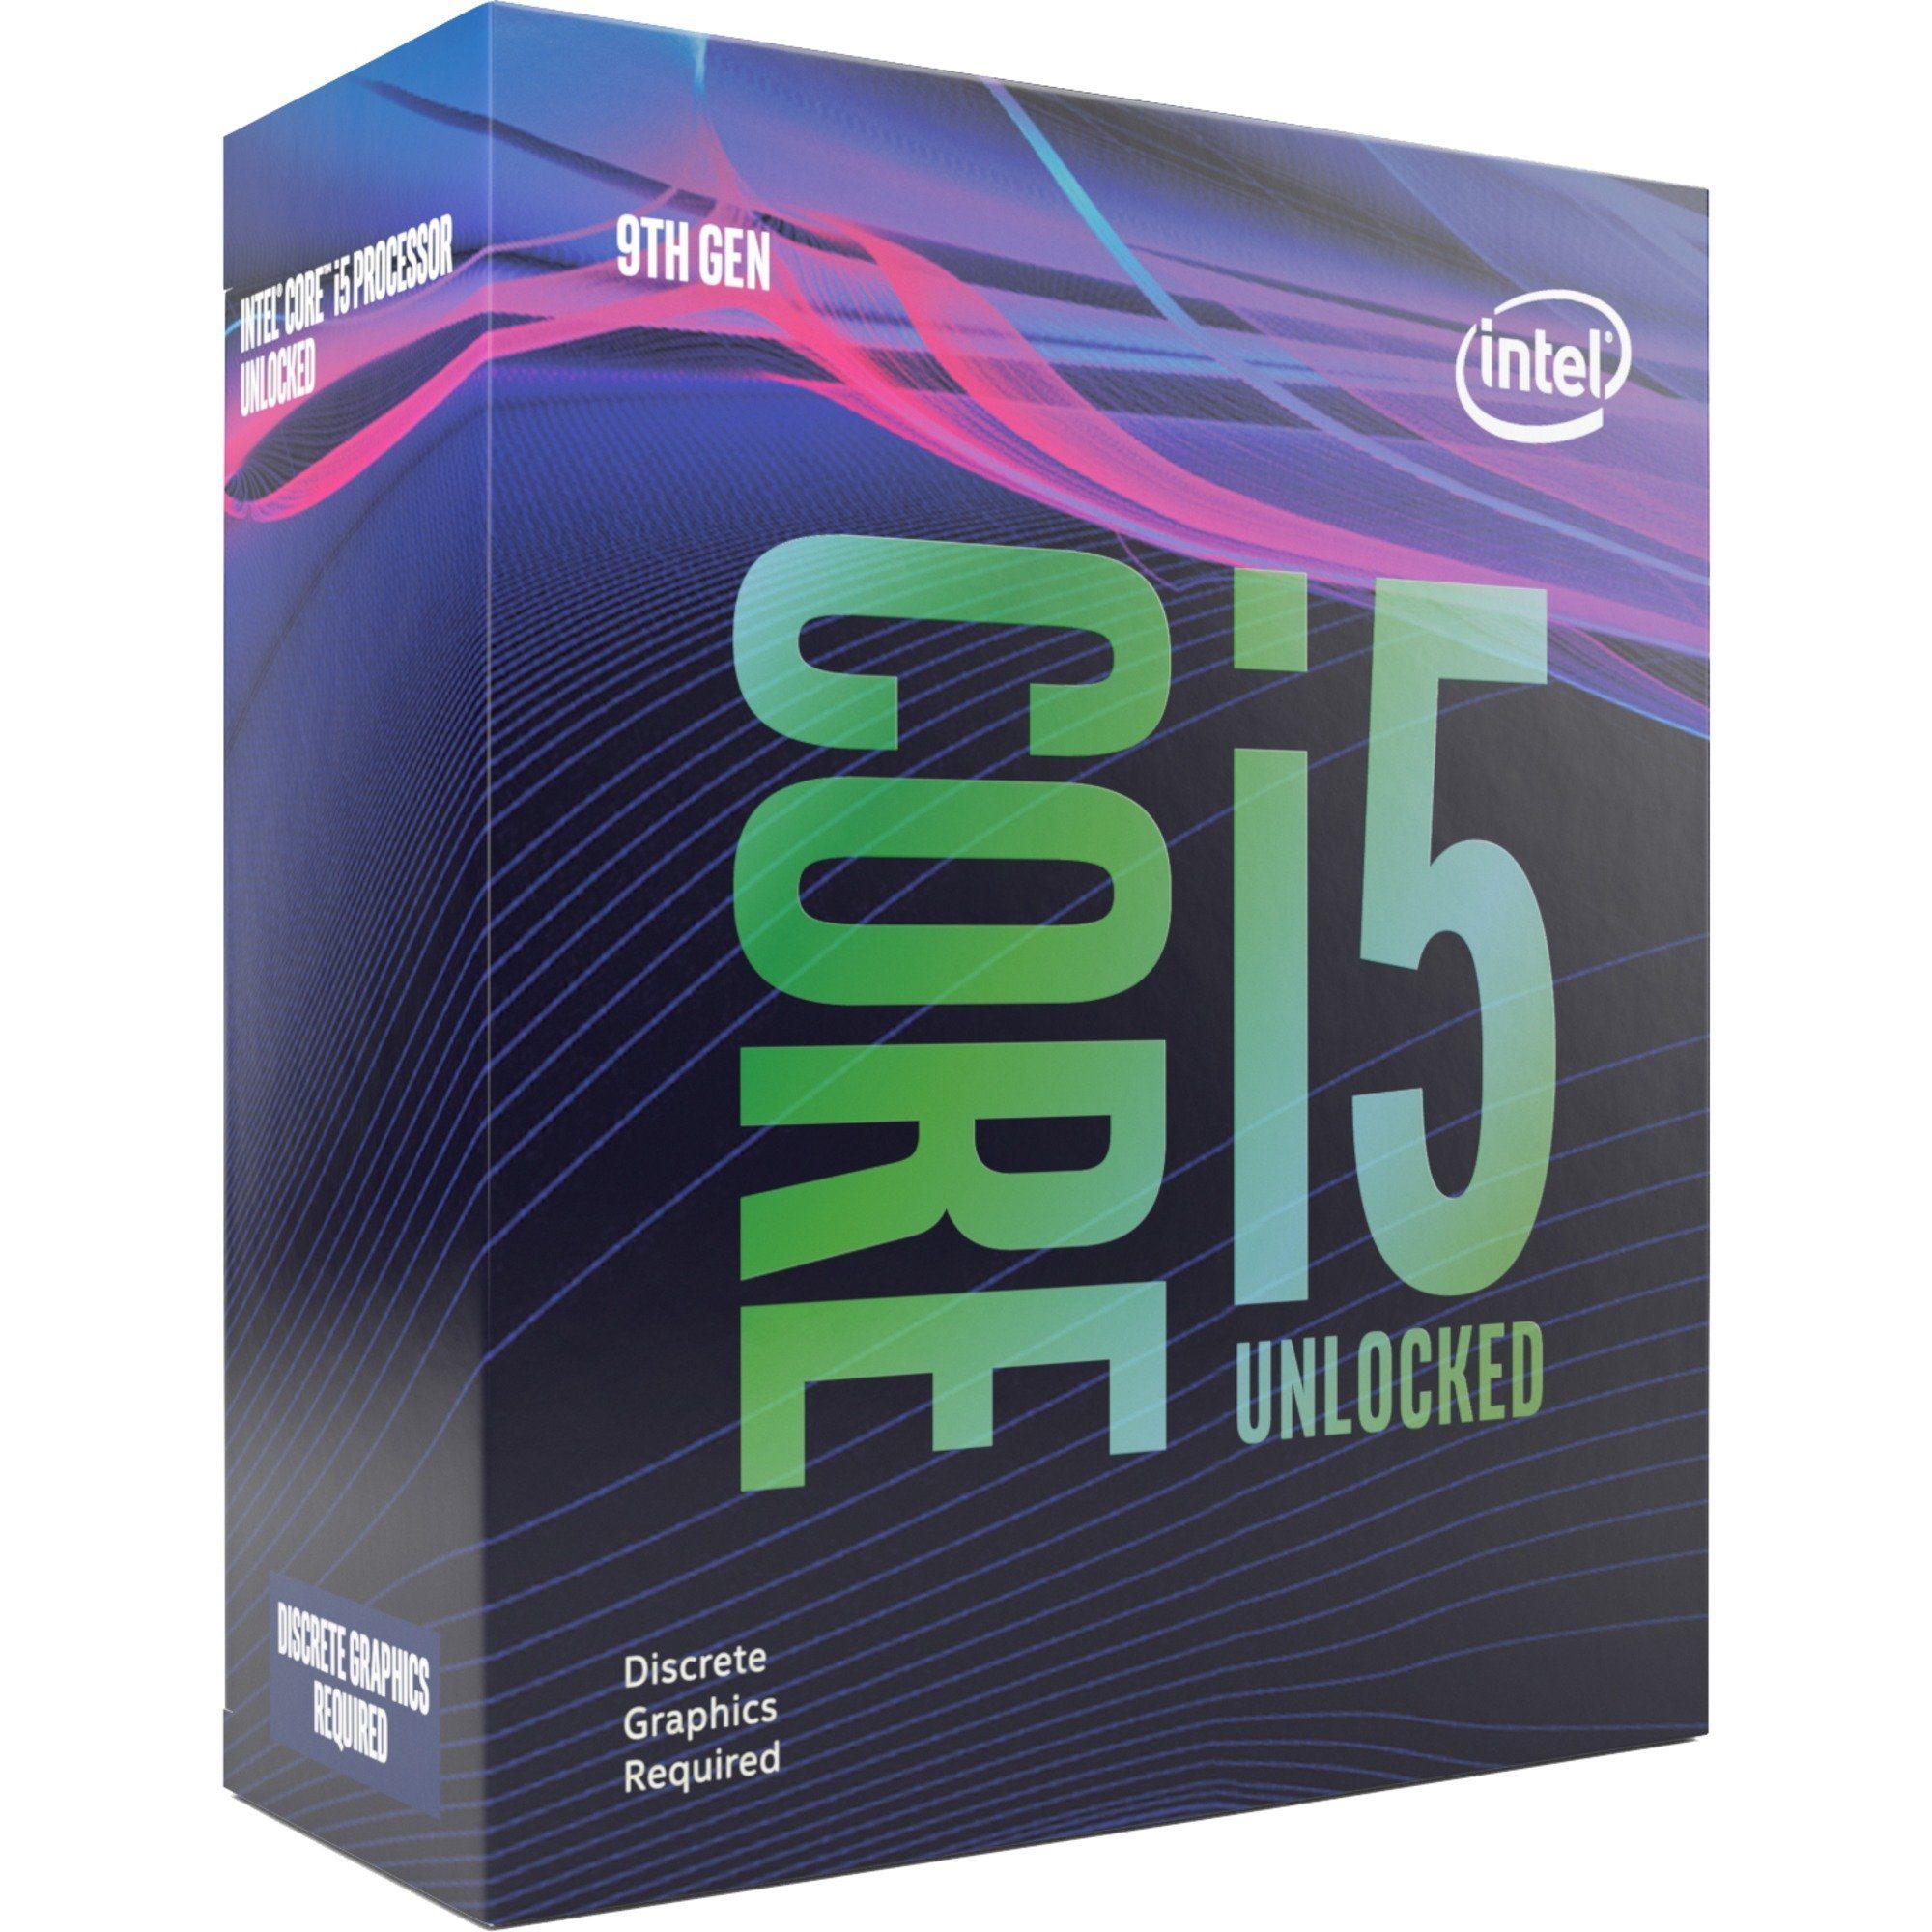 Intel Core i5 9600KF - 3.7 GHz - 6 Kerne - 6 Threads - 9 MB Cache-Speicher - LGA1151 Socket - Box